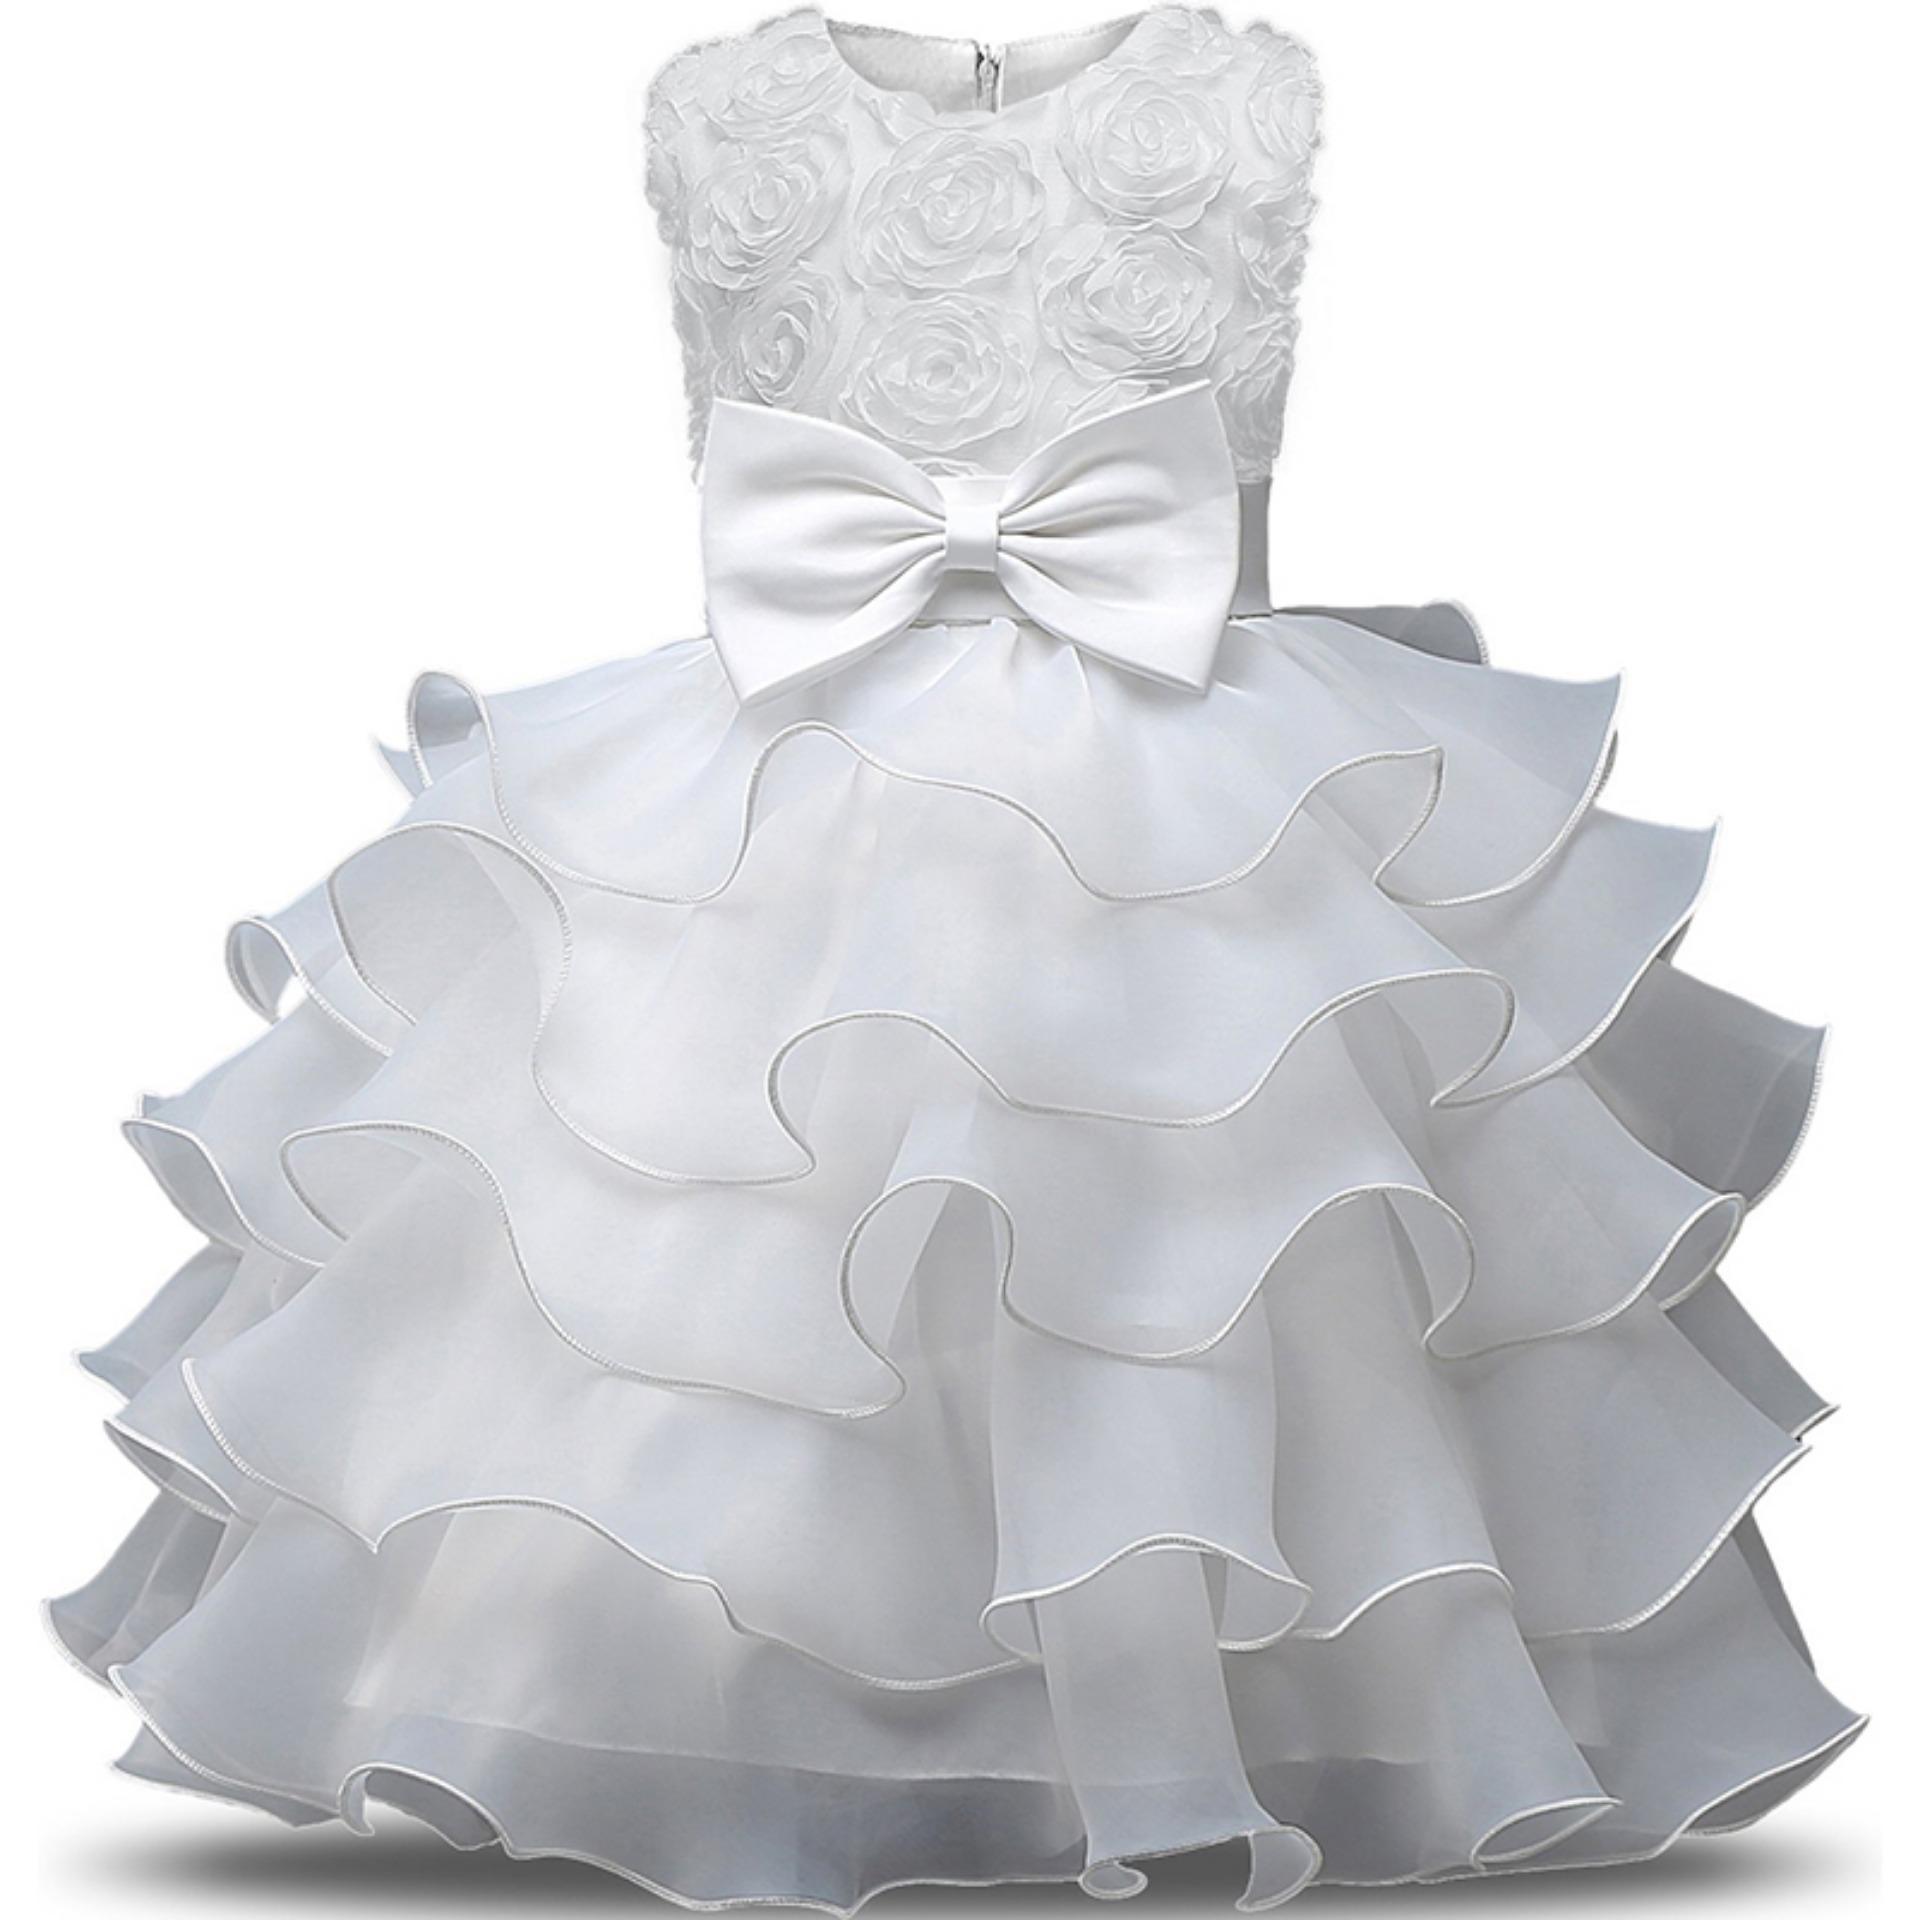 Gadis Gaun Anak Ruffles Renda Pesta Pernikahan Gaun Iblis Floral Putri Gaun Biru-Intl